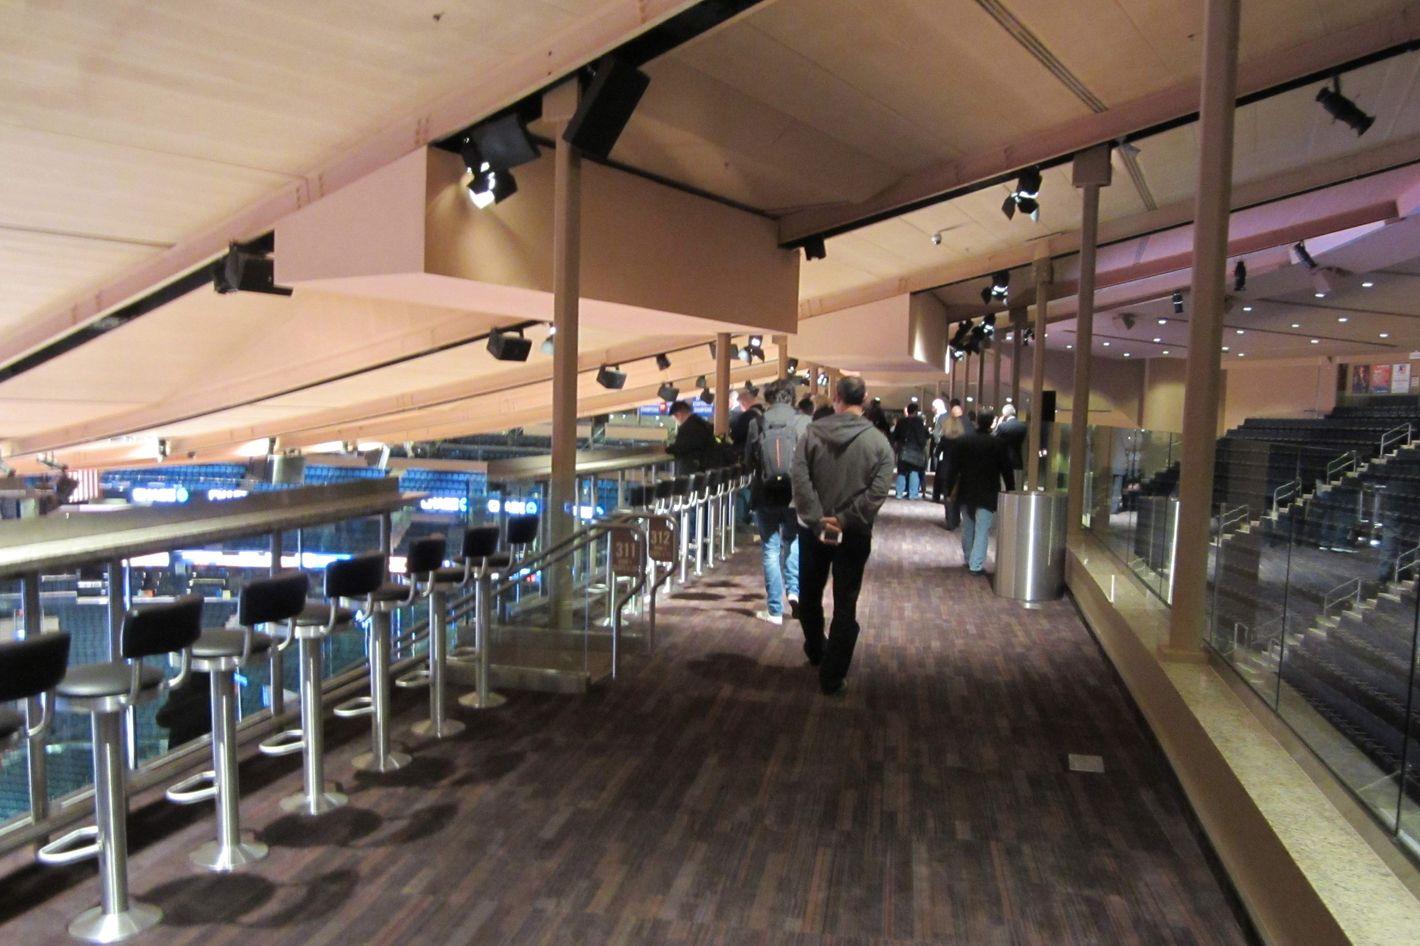 Madison Square Garden 200 Level Bar Stool Seats